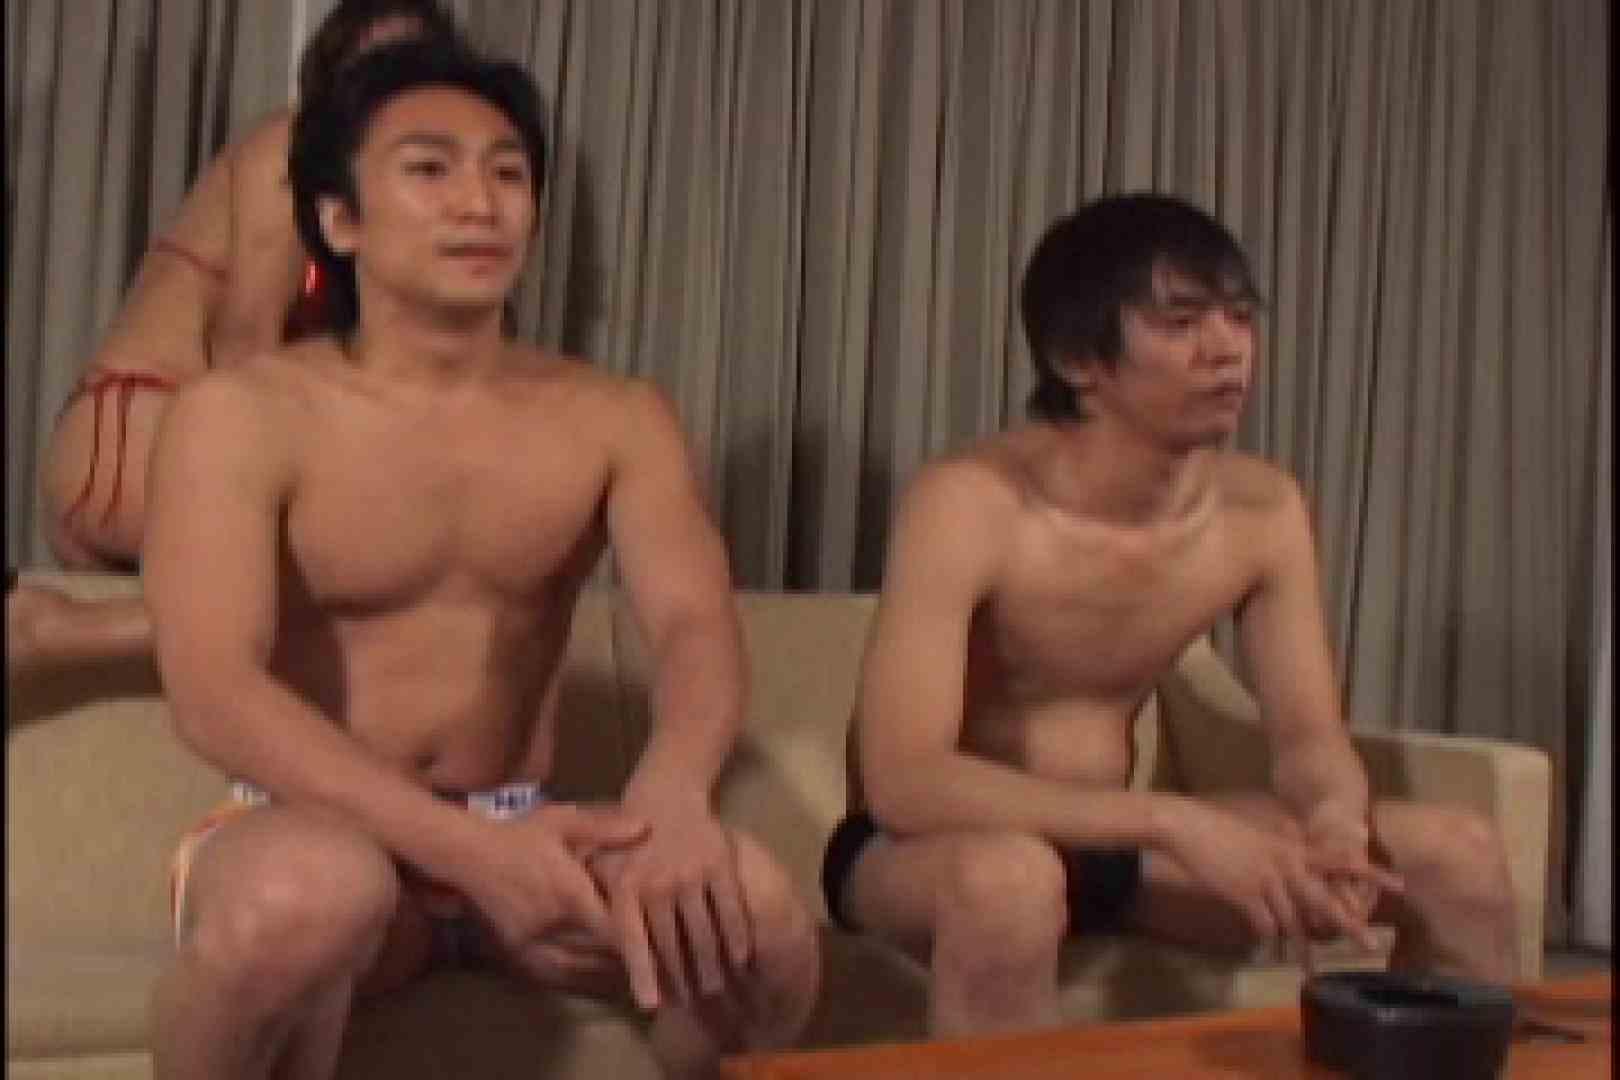 BEST OF イケメン!!男目線のガチSEX vol.04(対女性作品) 対女性 | イケメン・パラダイス  55画像 29